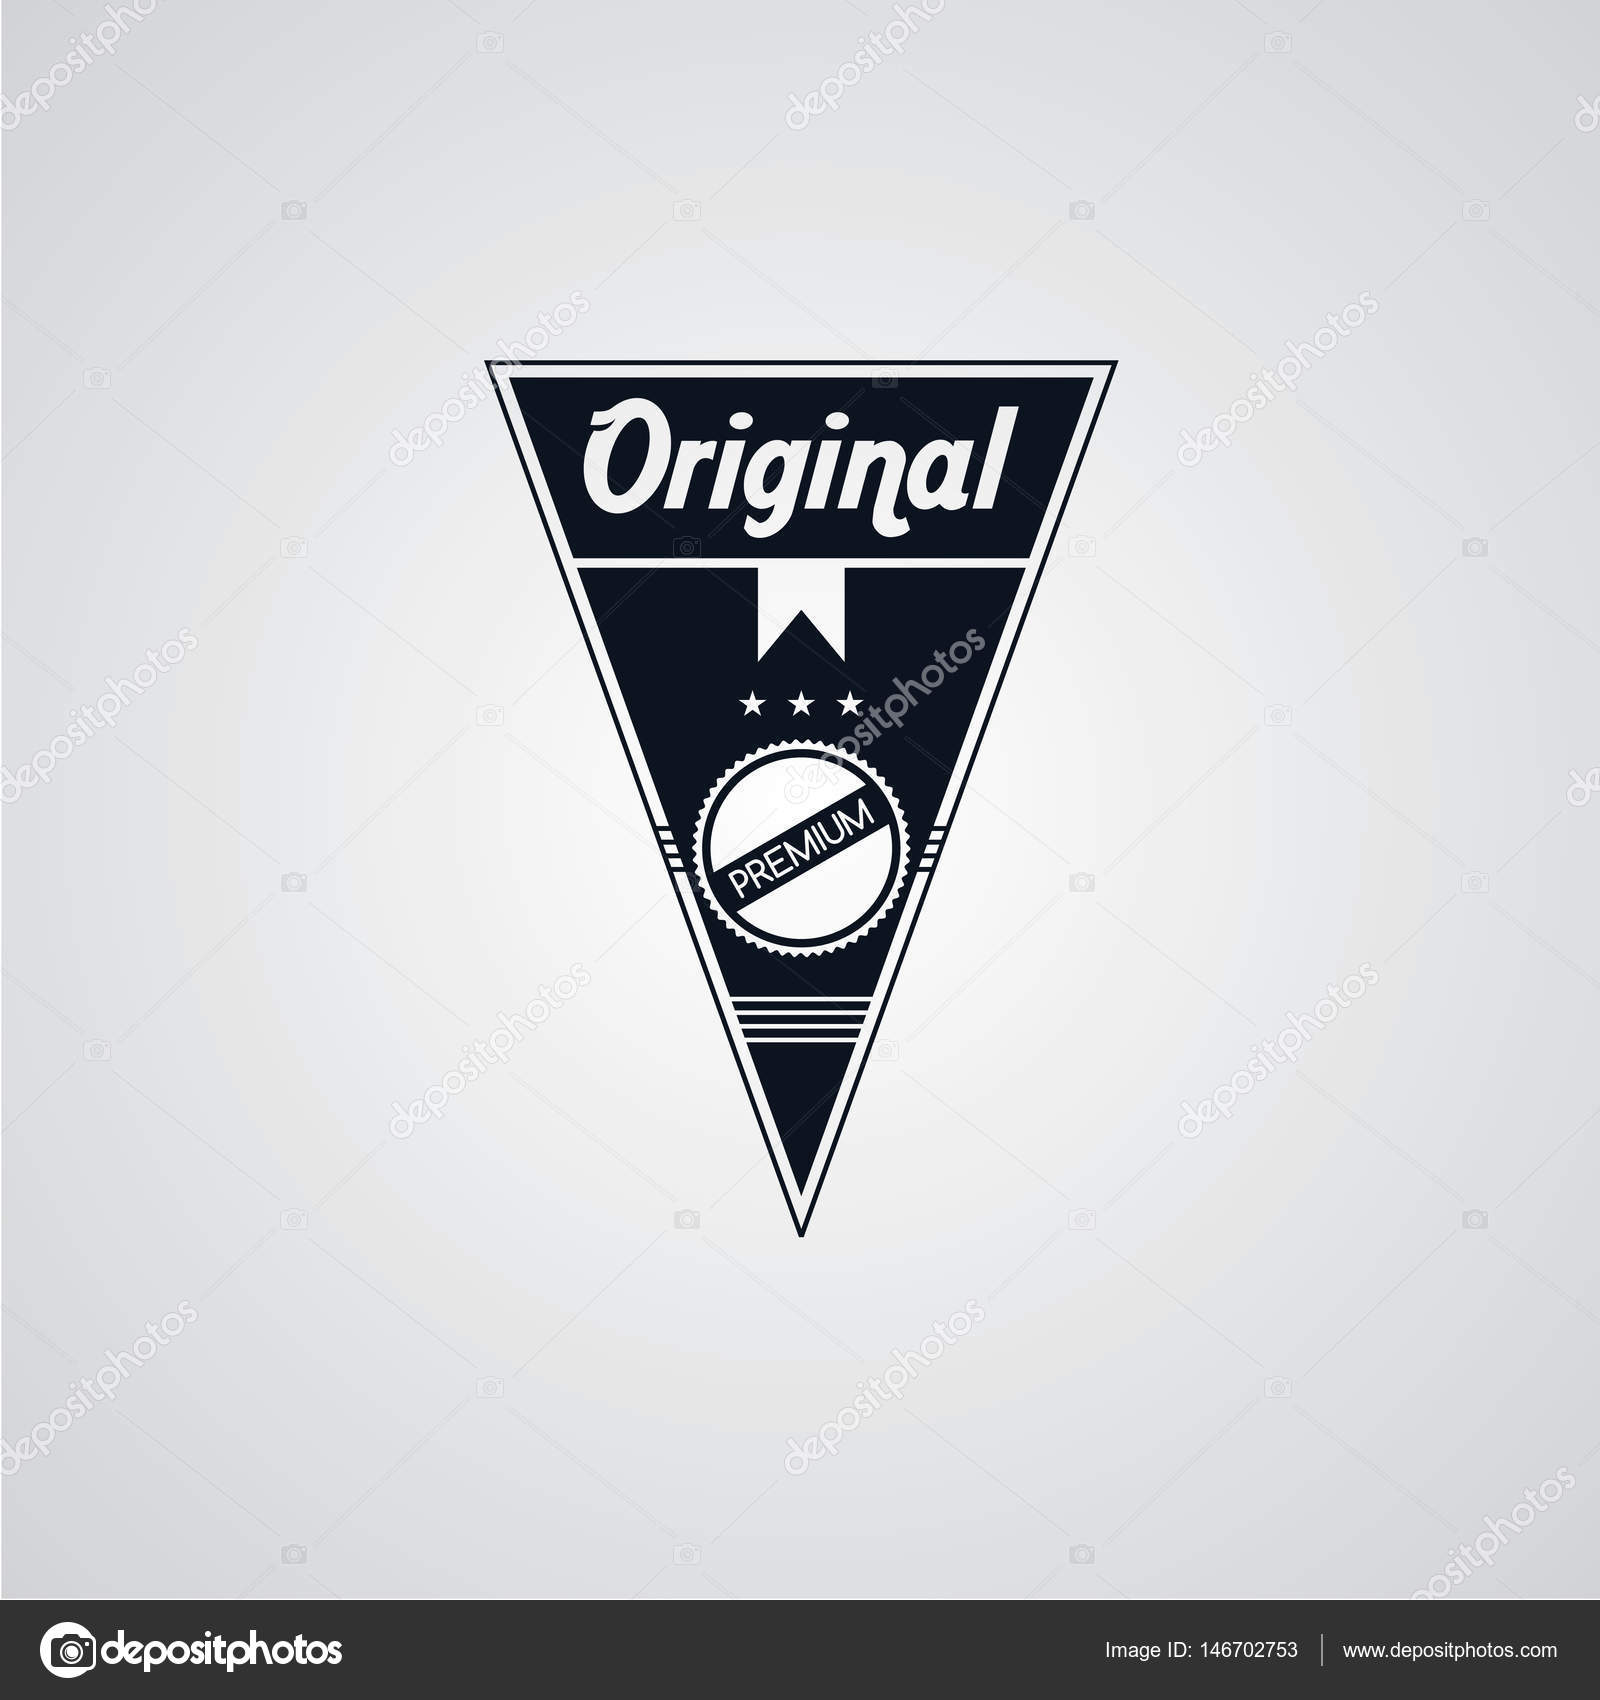 Vintage Badge Label Template Stock Vector C Vectorfirst 146702753